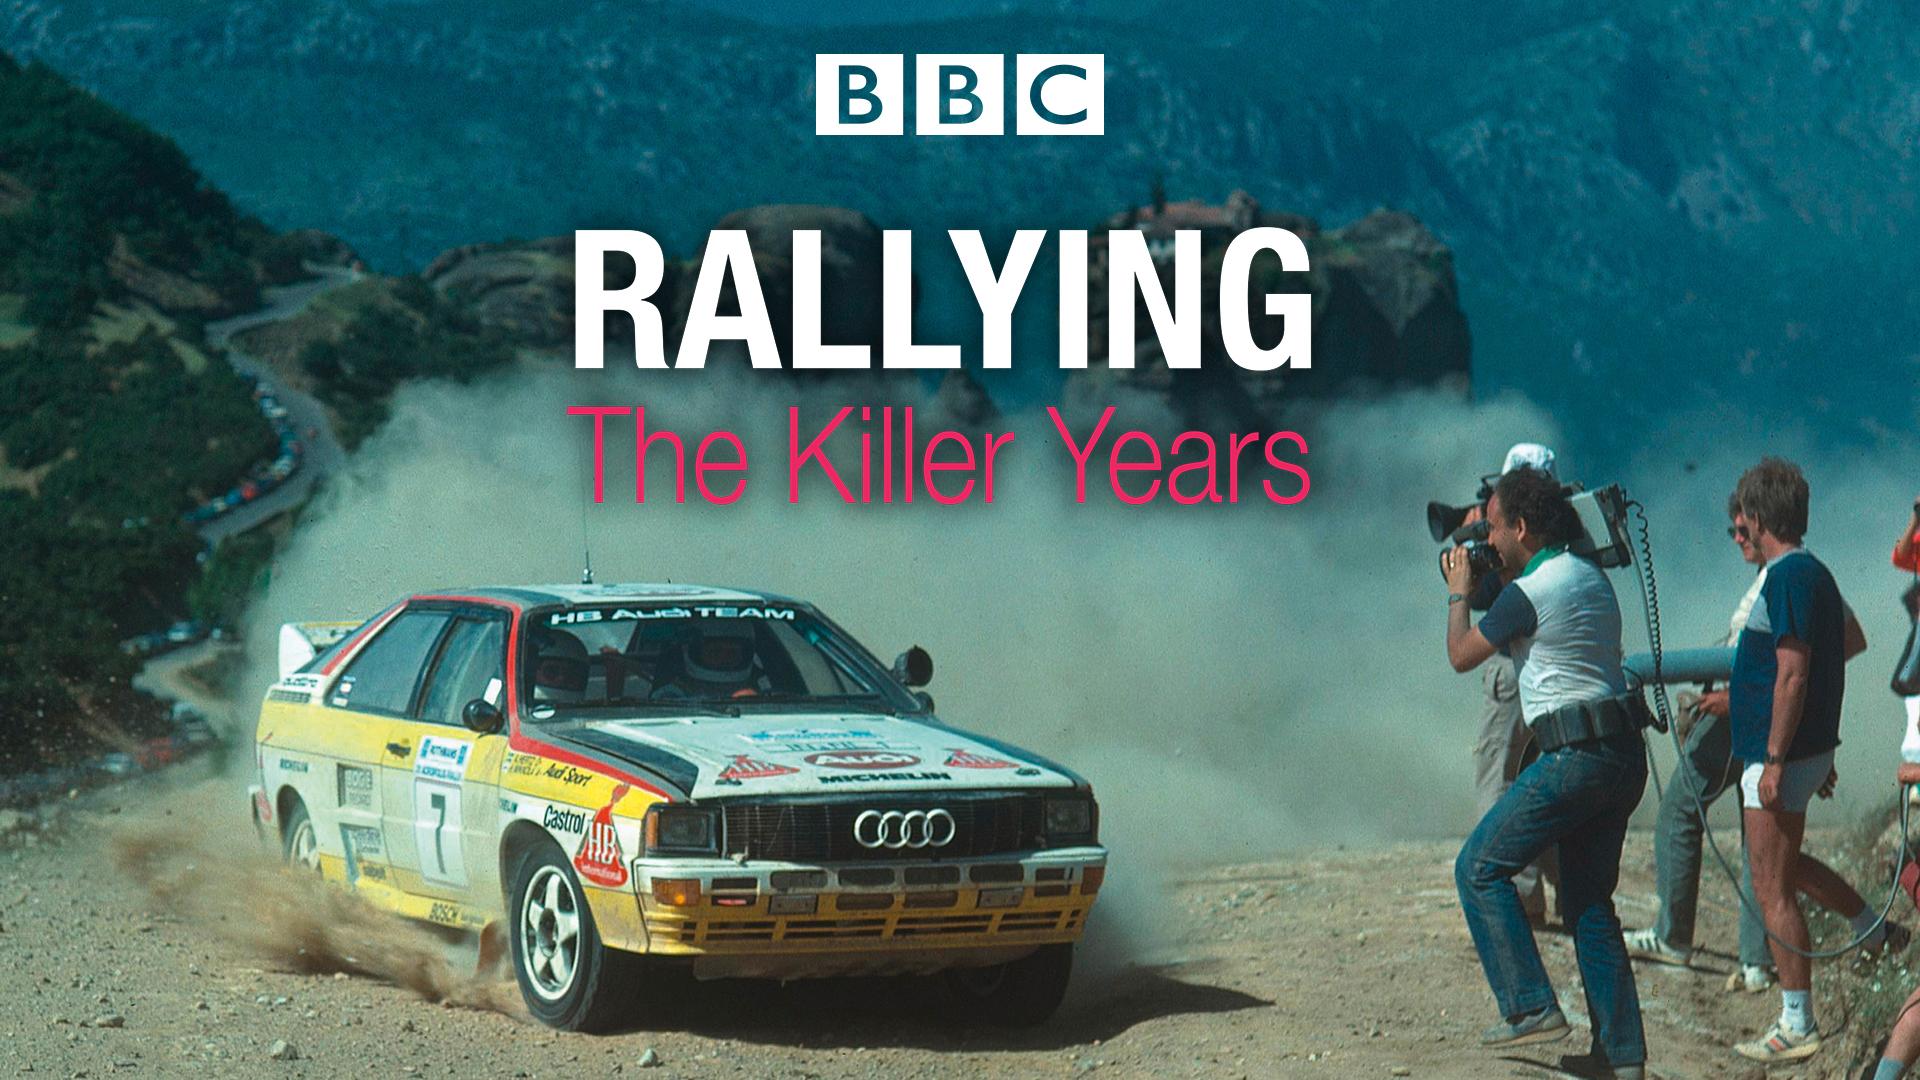 Rallying - The Killer Years